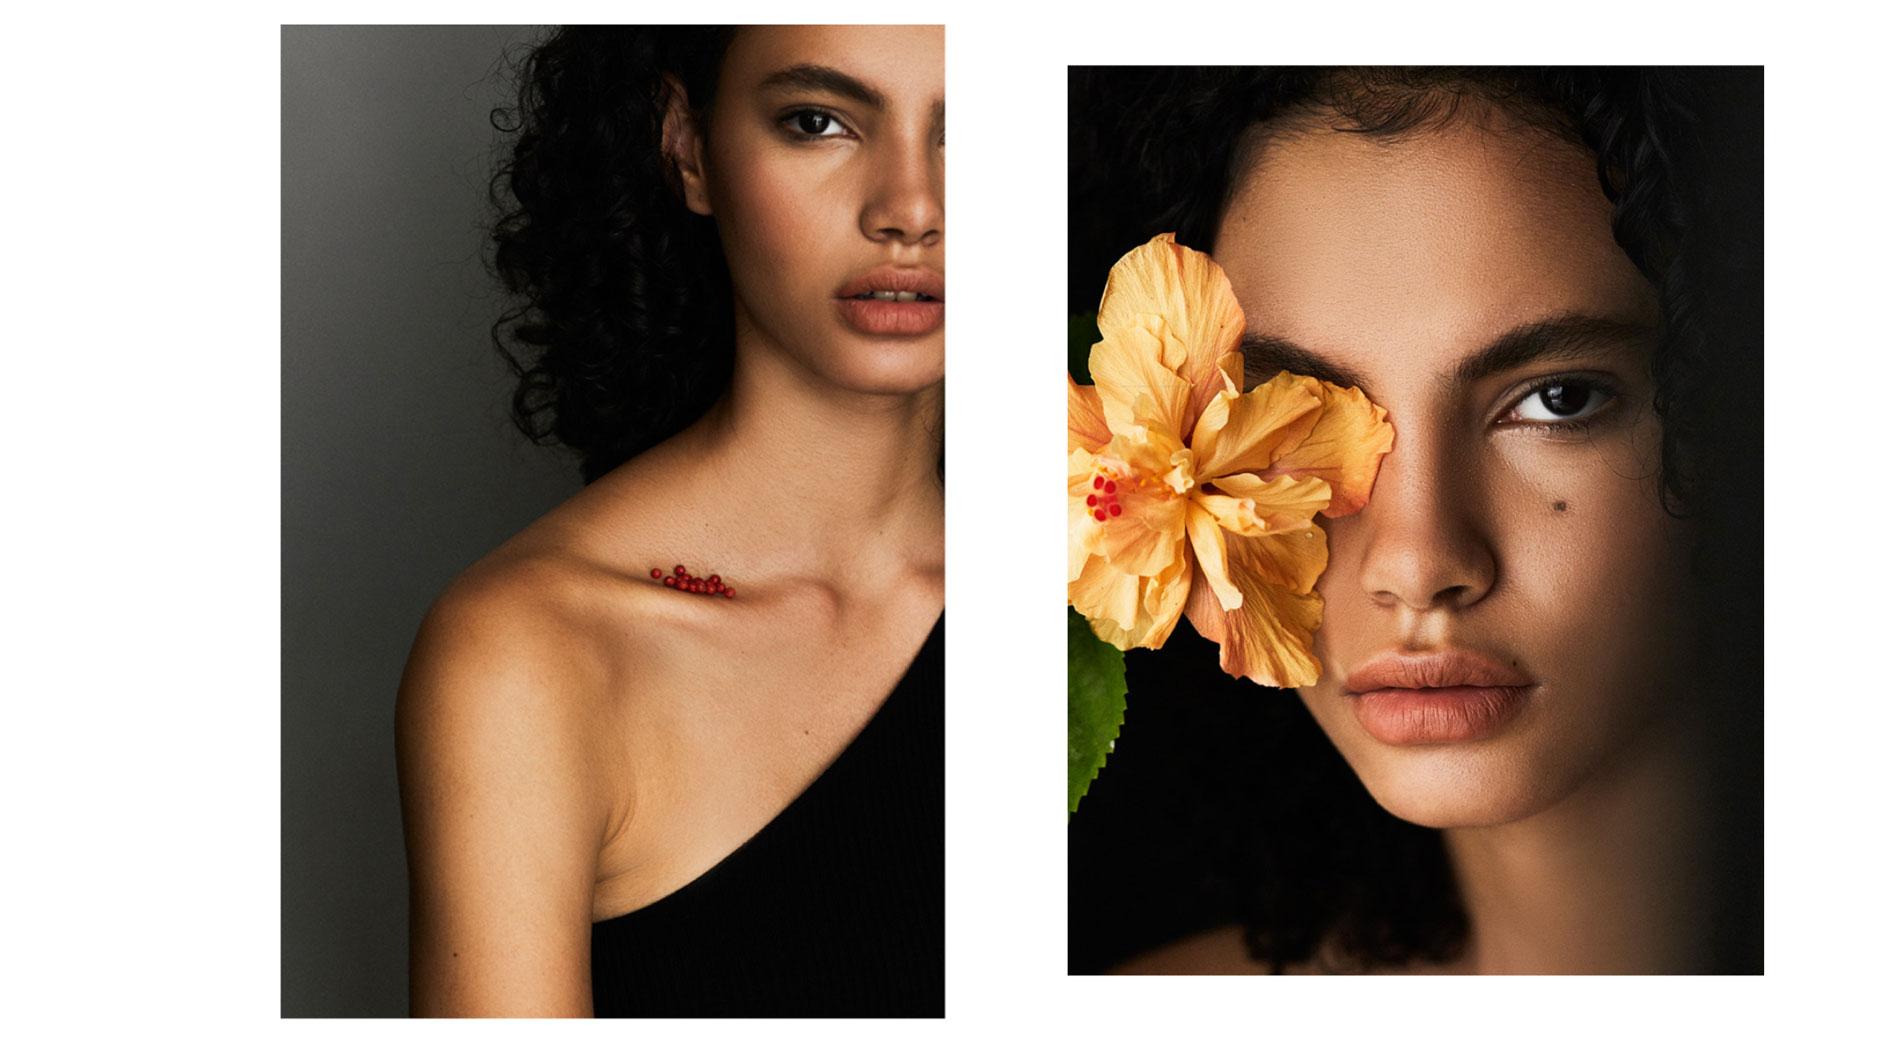 Seeds-04–LUMA—Photography.-Yukimi-Moromisato-Art-Direction-&-Styling.-Kate-Mogollón-Hair-&-Make-Up.-Debbie-Ray-Model.-Luma-Vitória-@-WeLove-Models-Perú-@amusemag-amusemag